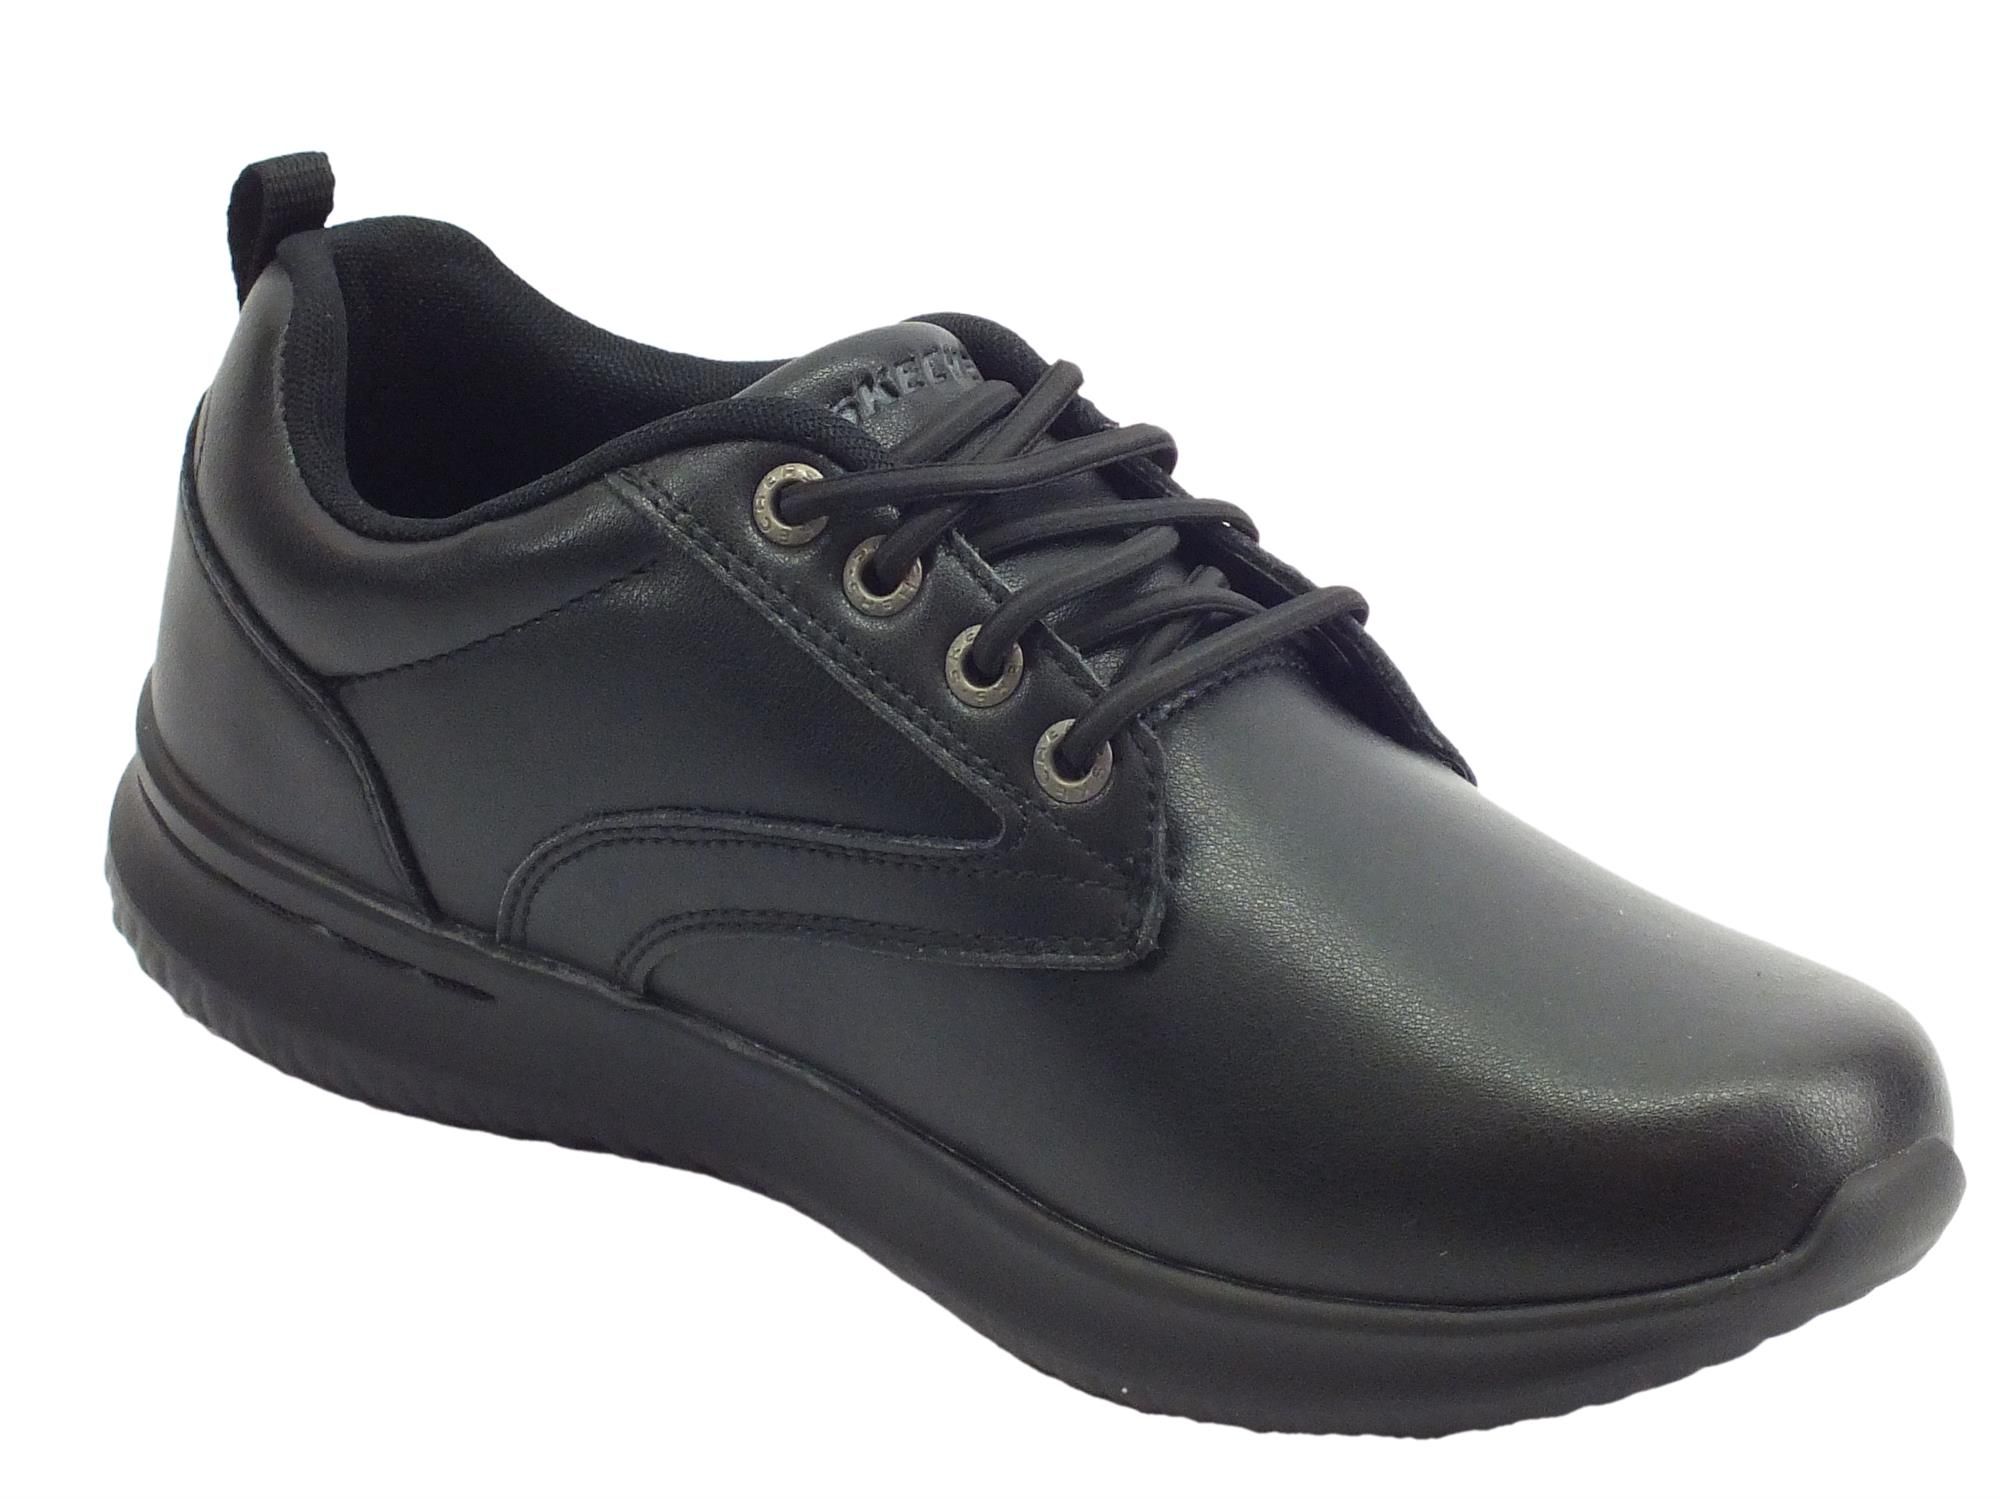 Skechers 65693BBK Delson Antigo Black Scarpe in ecopelle Waterproof